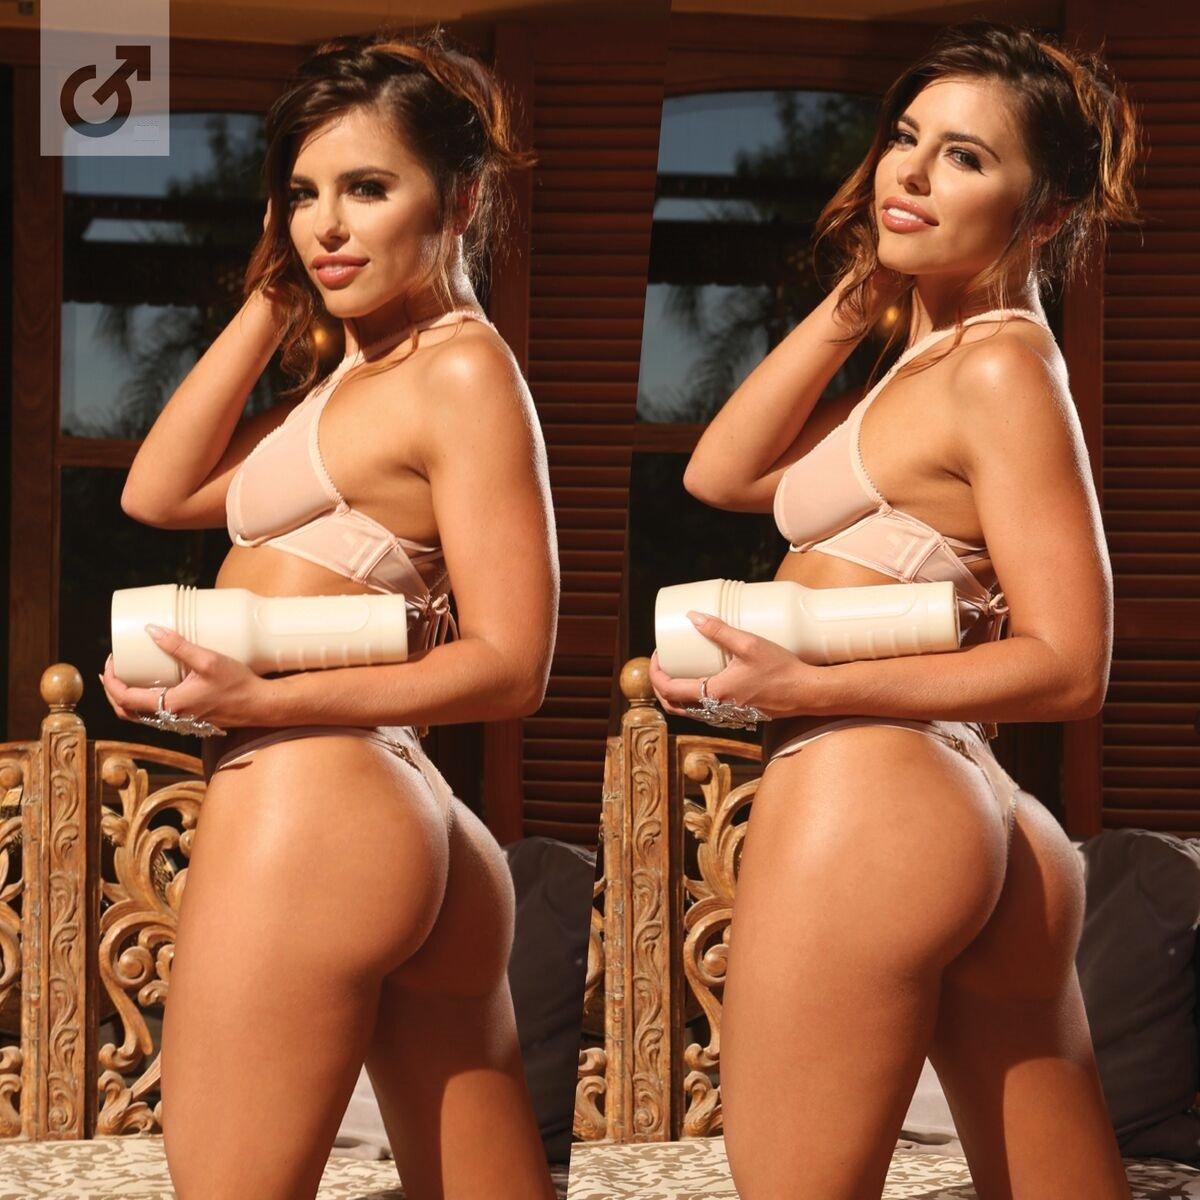 Fleshlight Girls   Adriana Chechik   Next Level   High Quality Anal Sex Stroker by Fleshlight (Image #3)